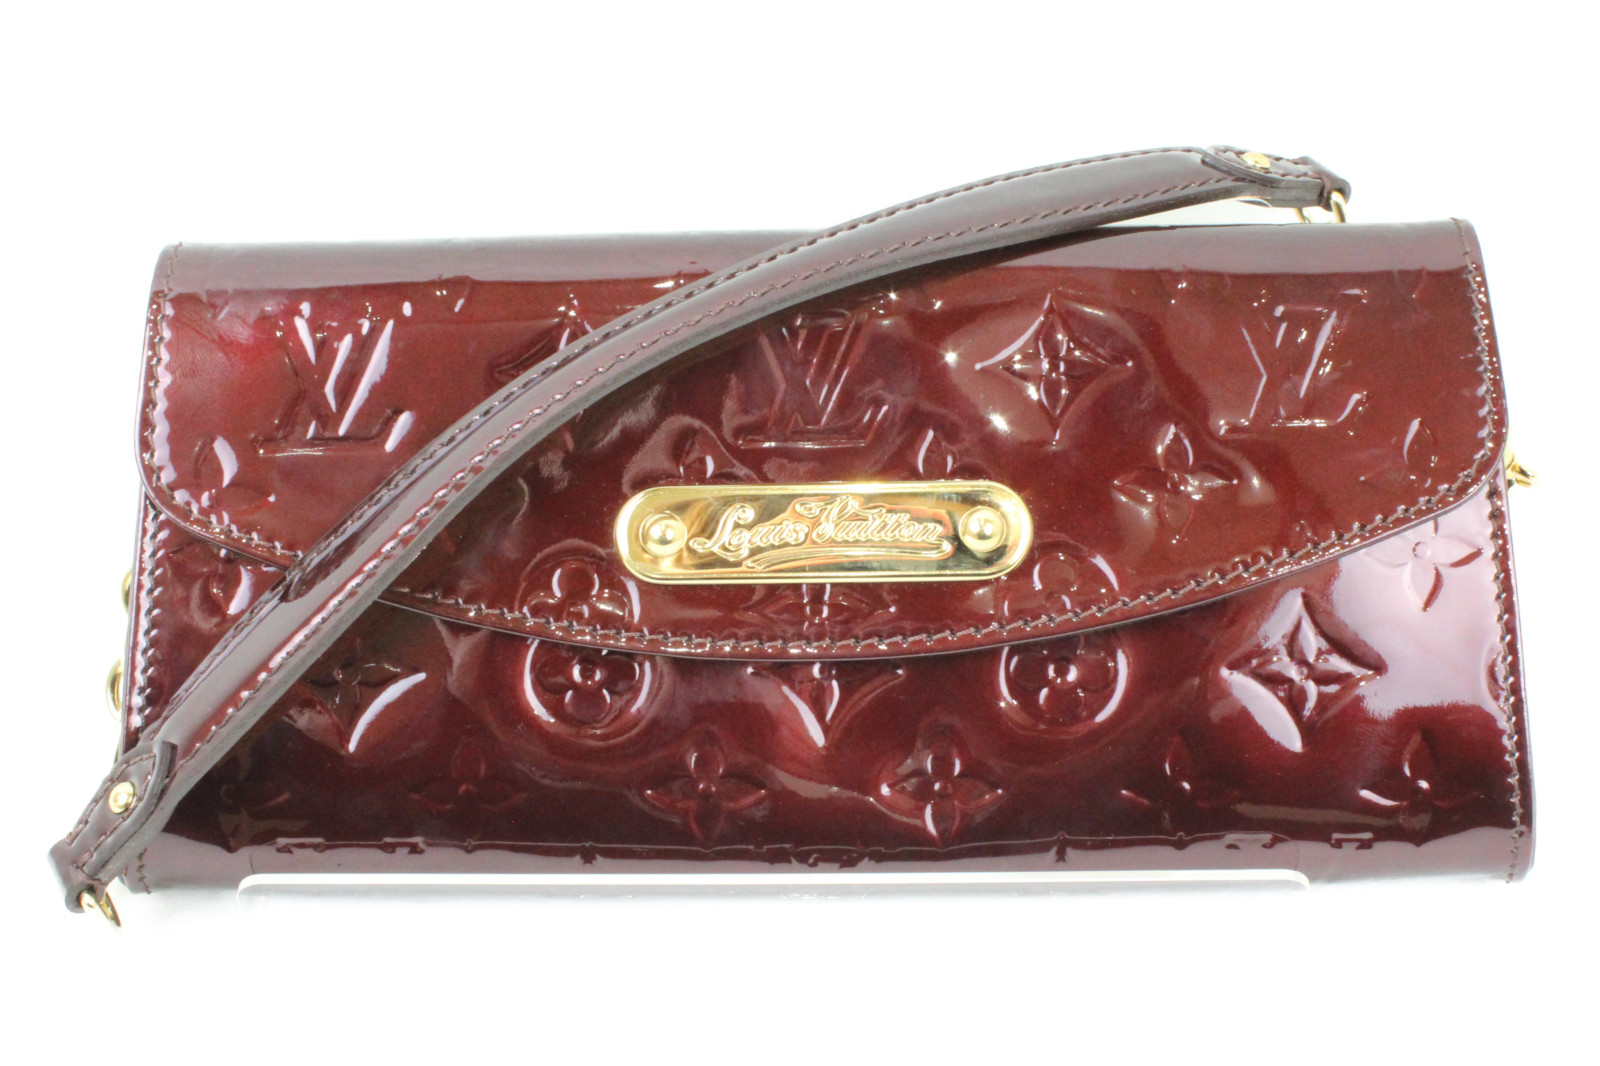 LOUIS VUITTON ルイヴィトンサンセット・ブルーバード M93542モノグラム・ヴェルニお財布 バッグ 人気カラーパーティ プレゼント包装可【中古】